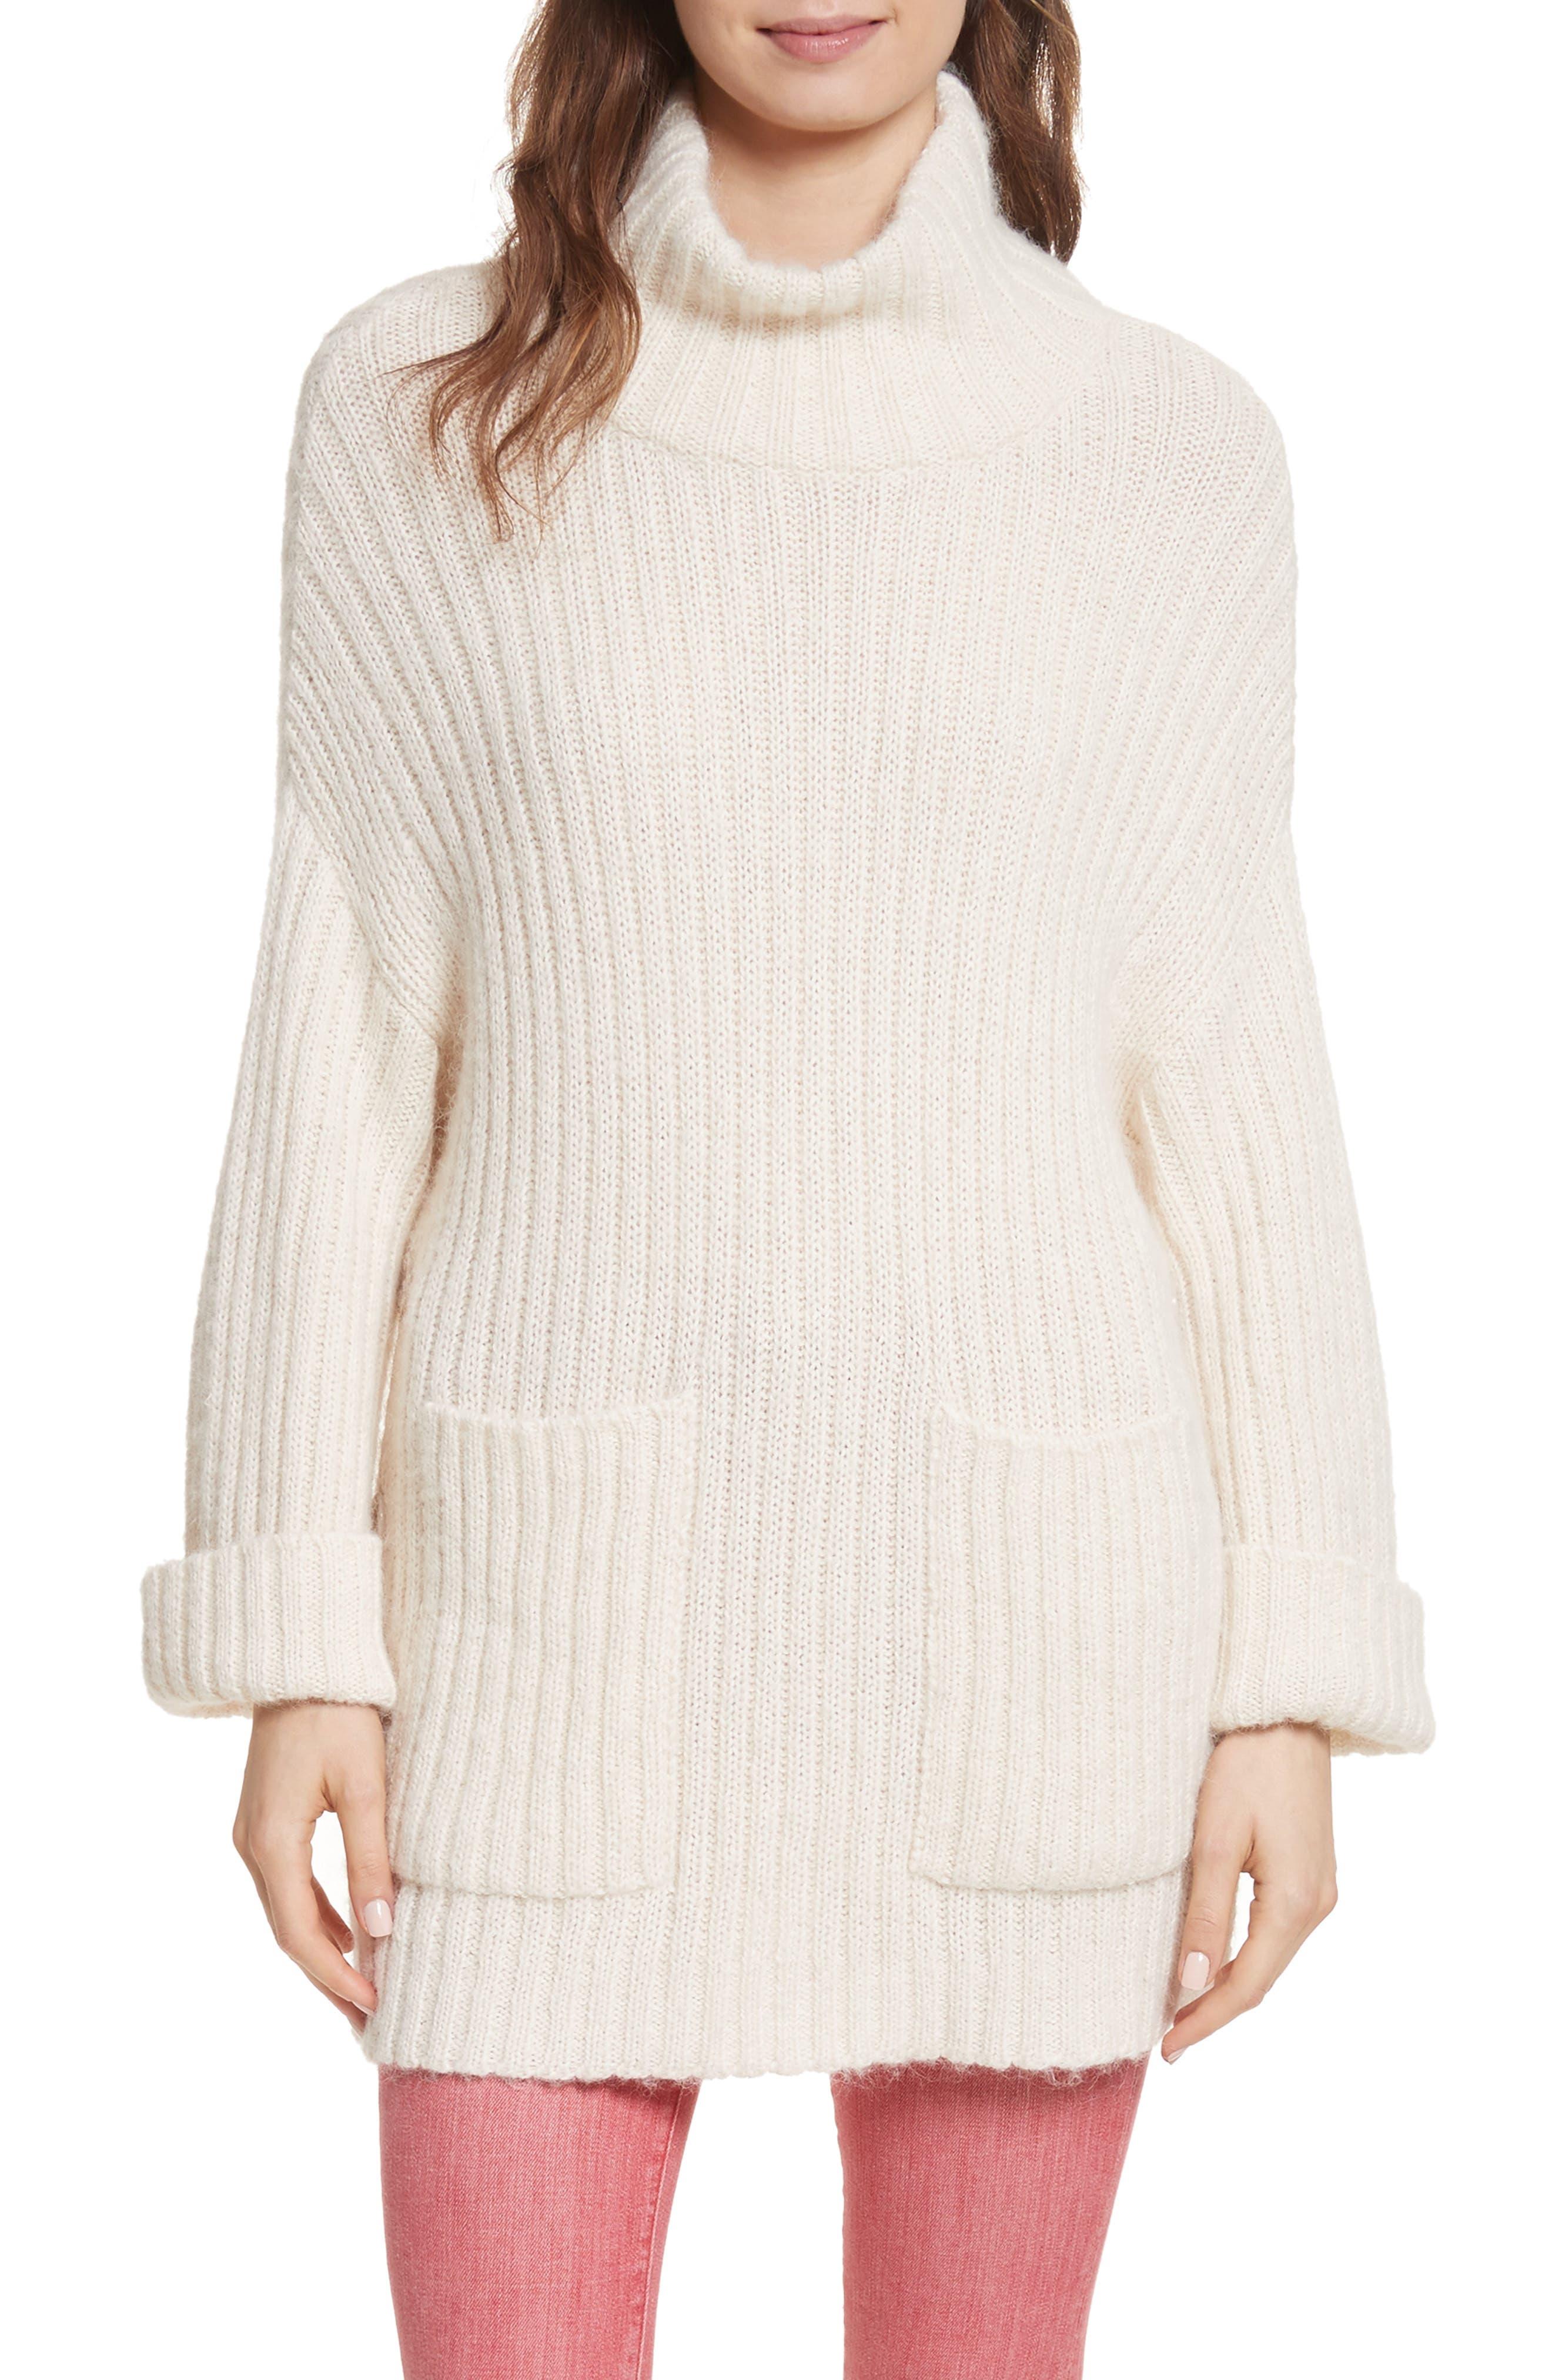 Banain Turtleneck Sweater,                         Main,                         color, 114